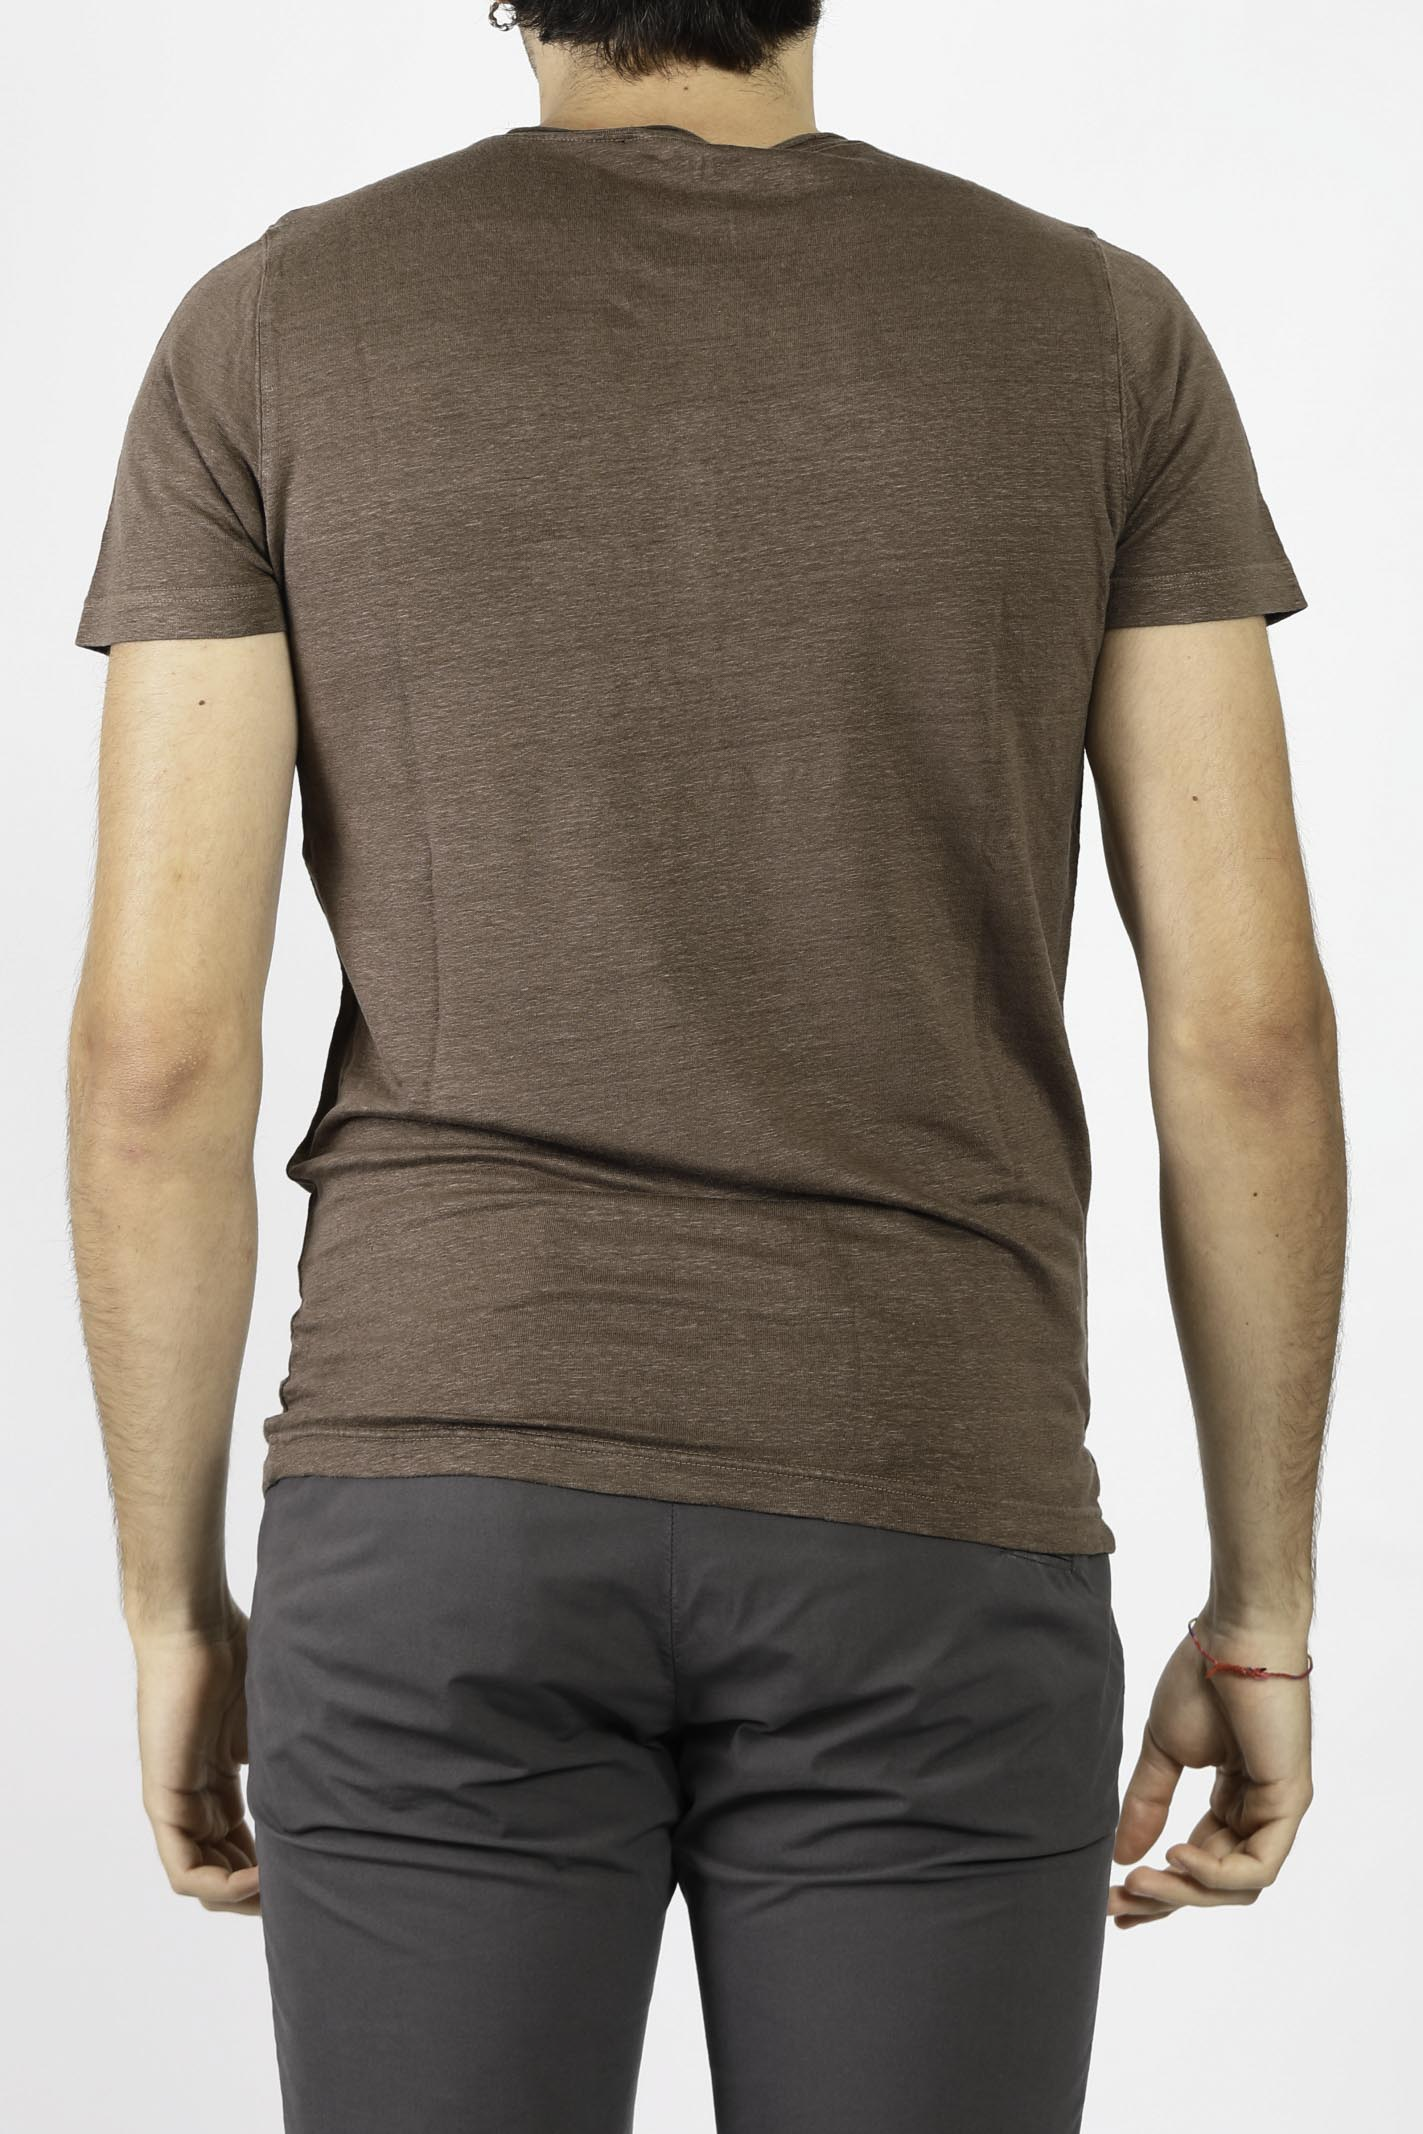 SERAFINO IN COTONE JEORDIE'S | T-shirt | 80740356